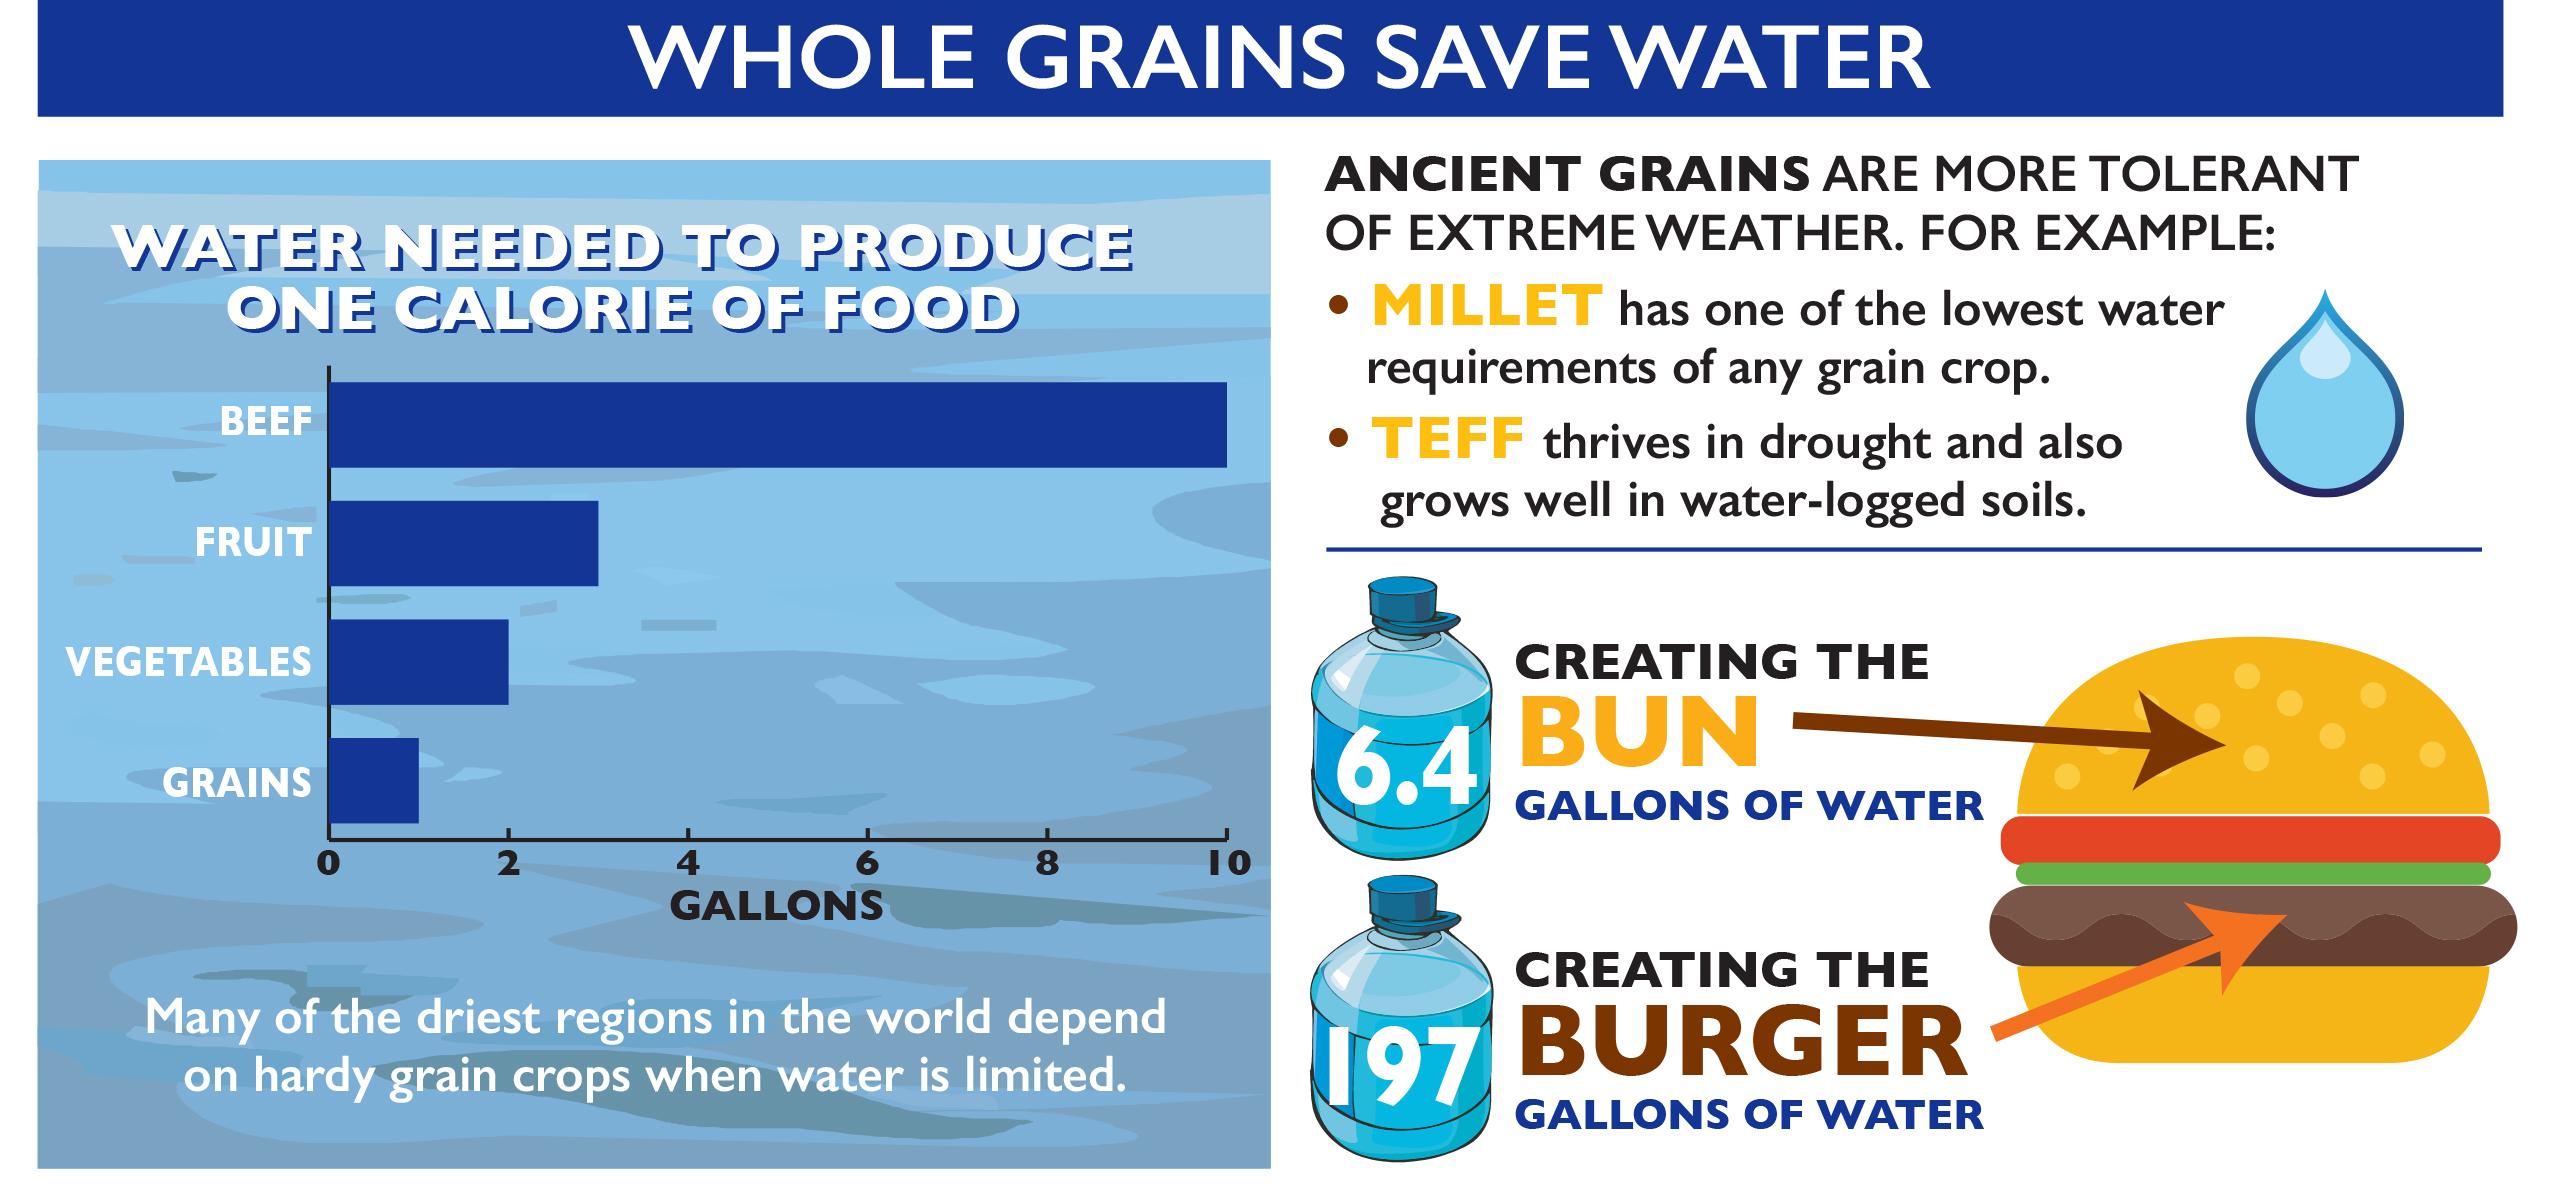 WG_SustainableFood_infographic-2.jpg